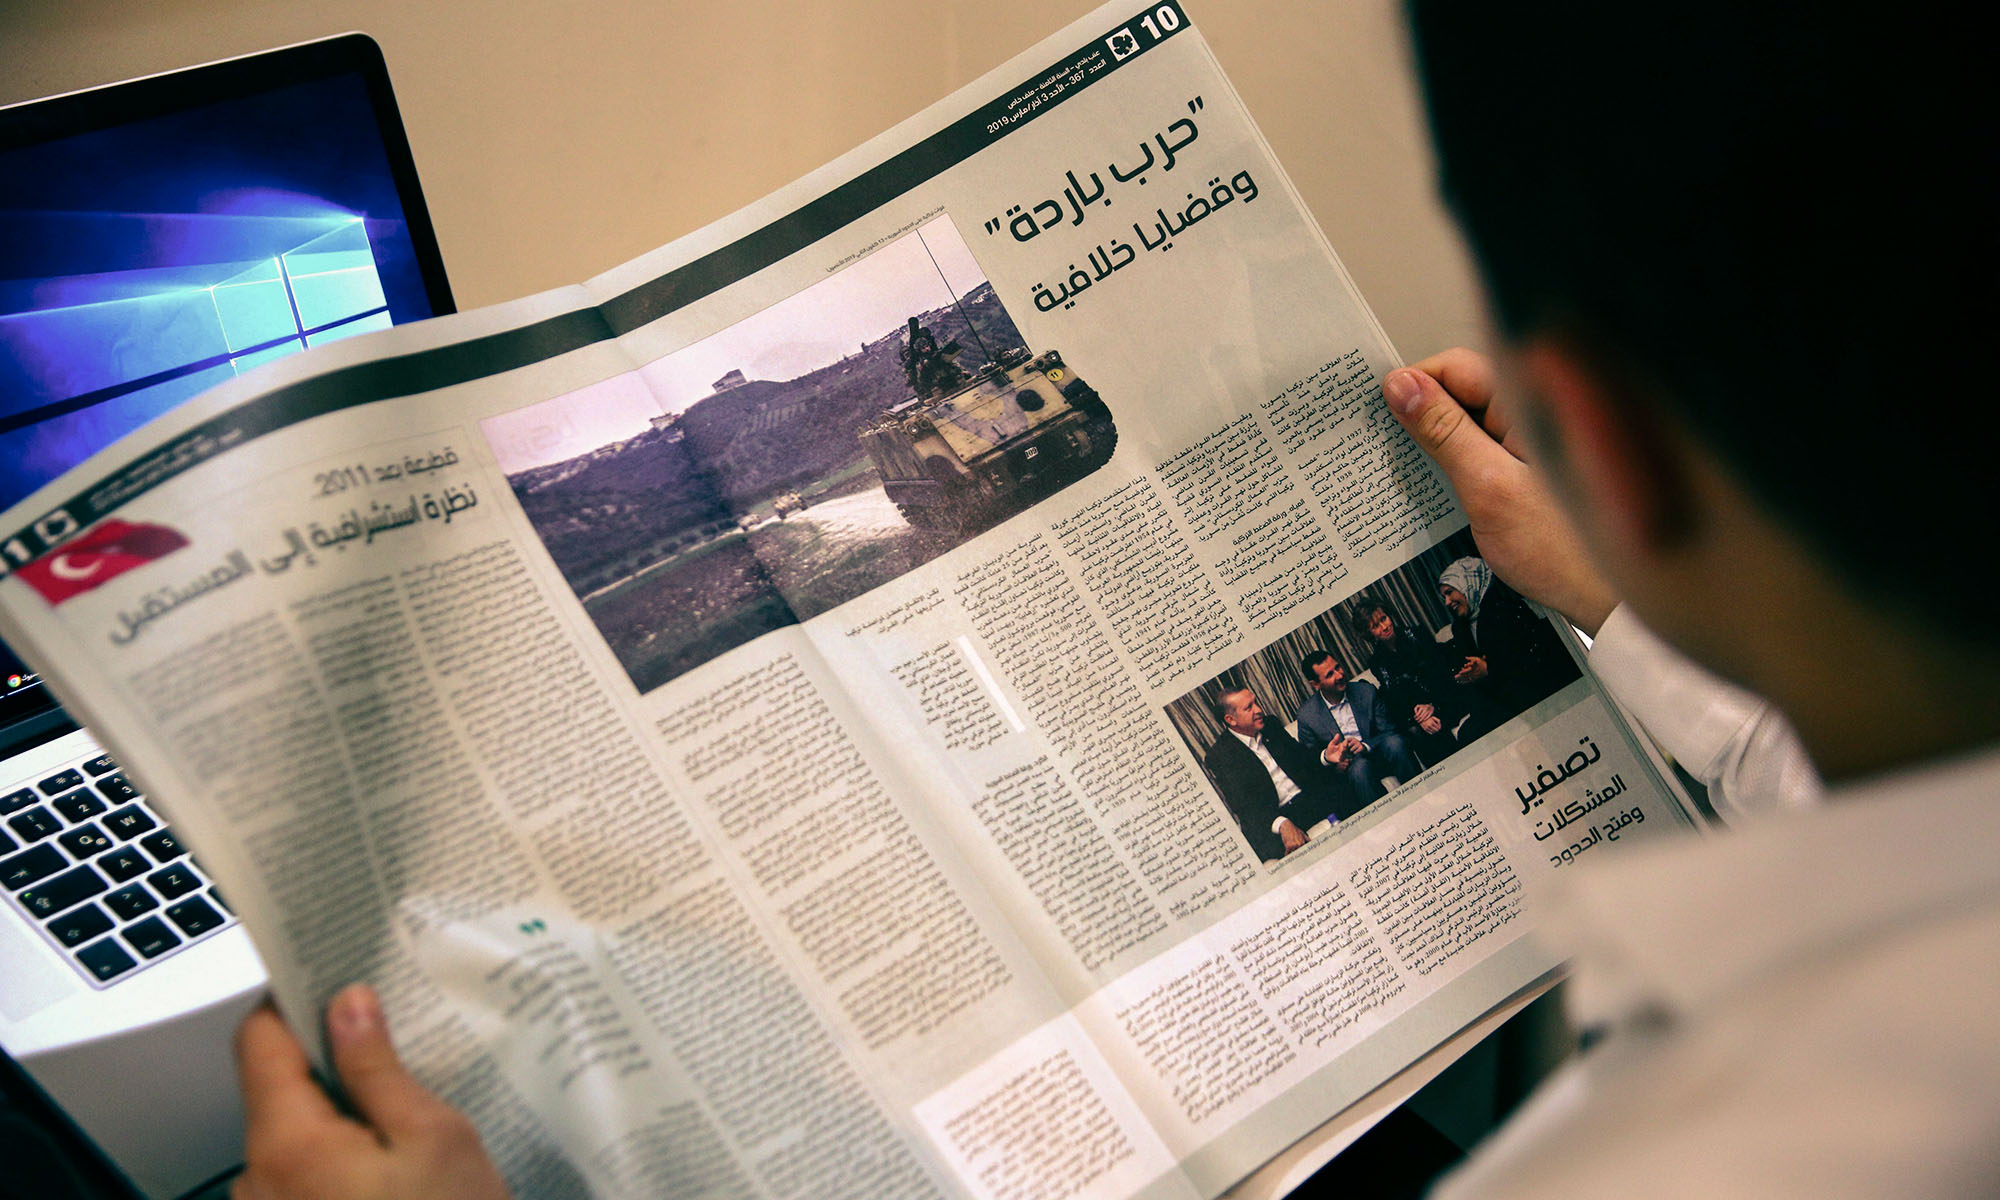 Enab Baladi Newspaper